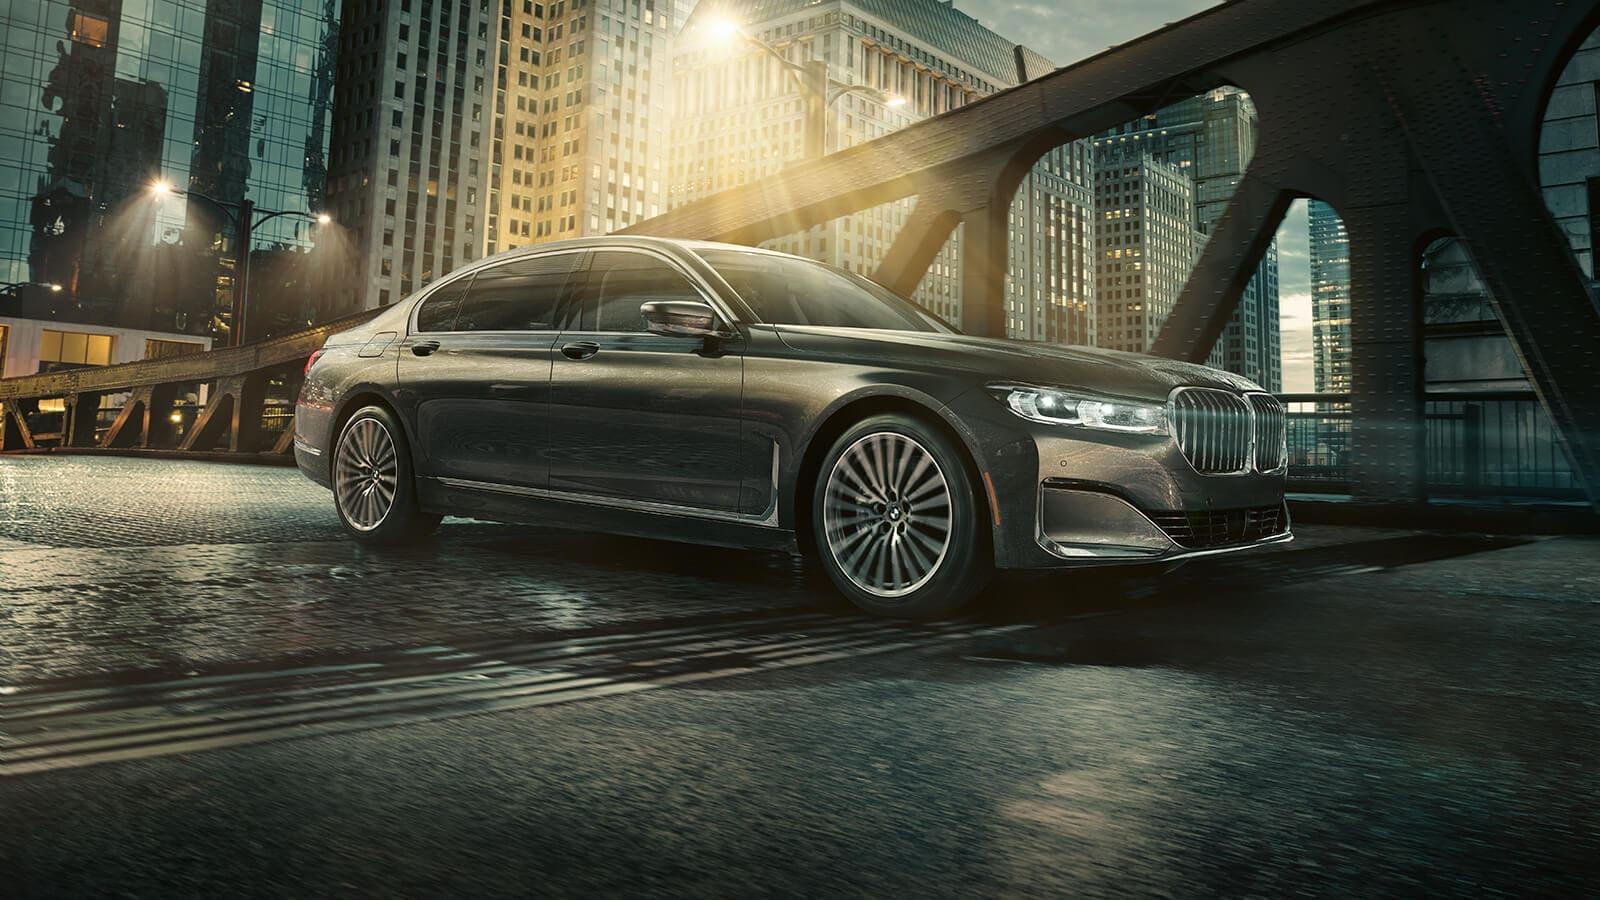 2021 BMW 7 Series in Bakersfield, California